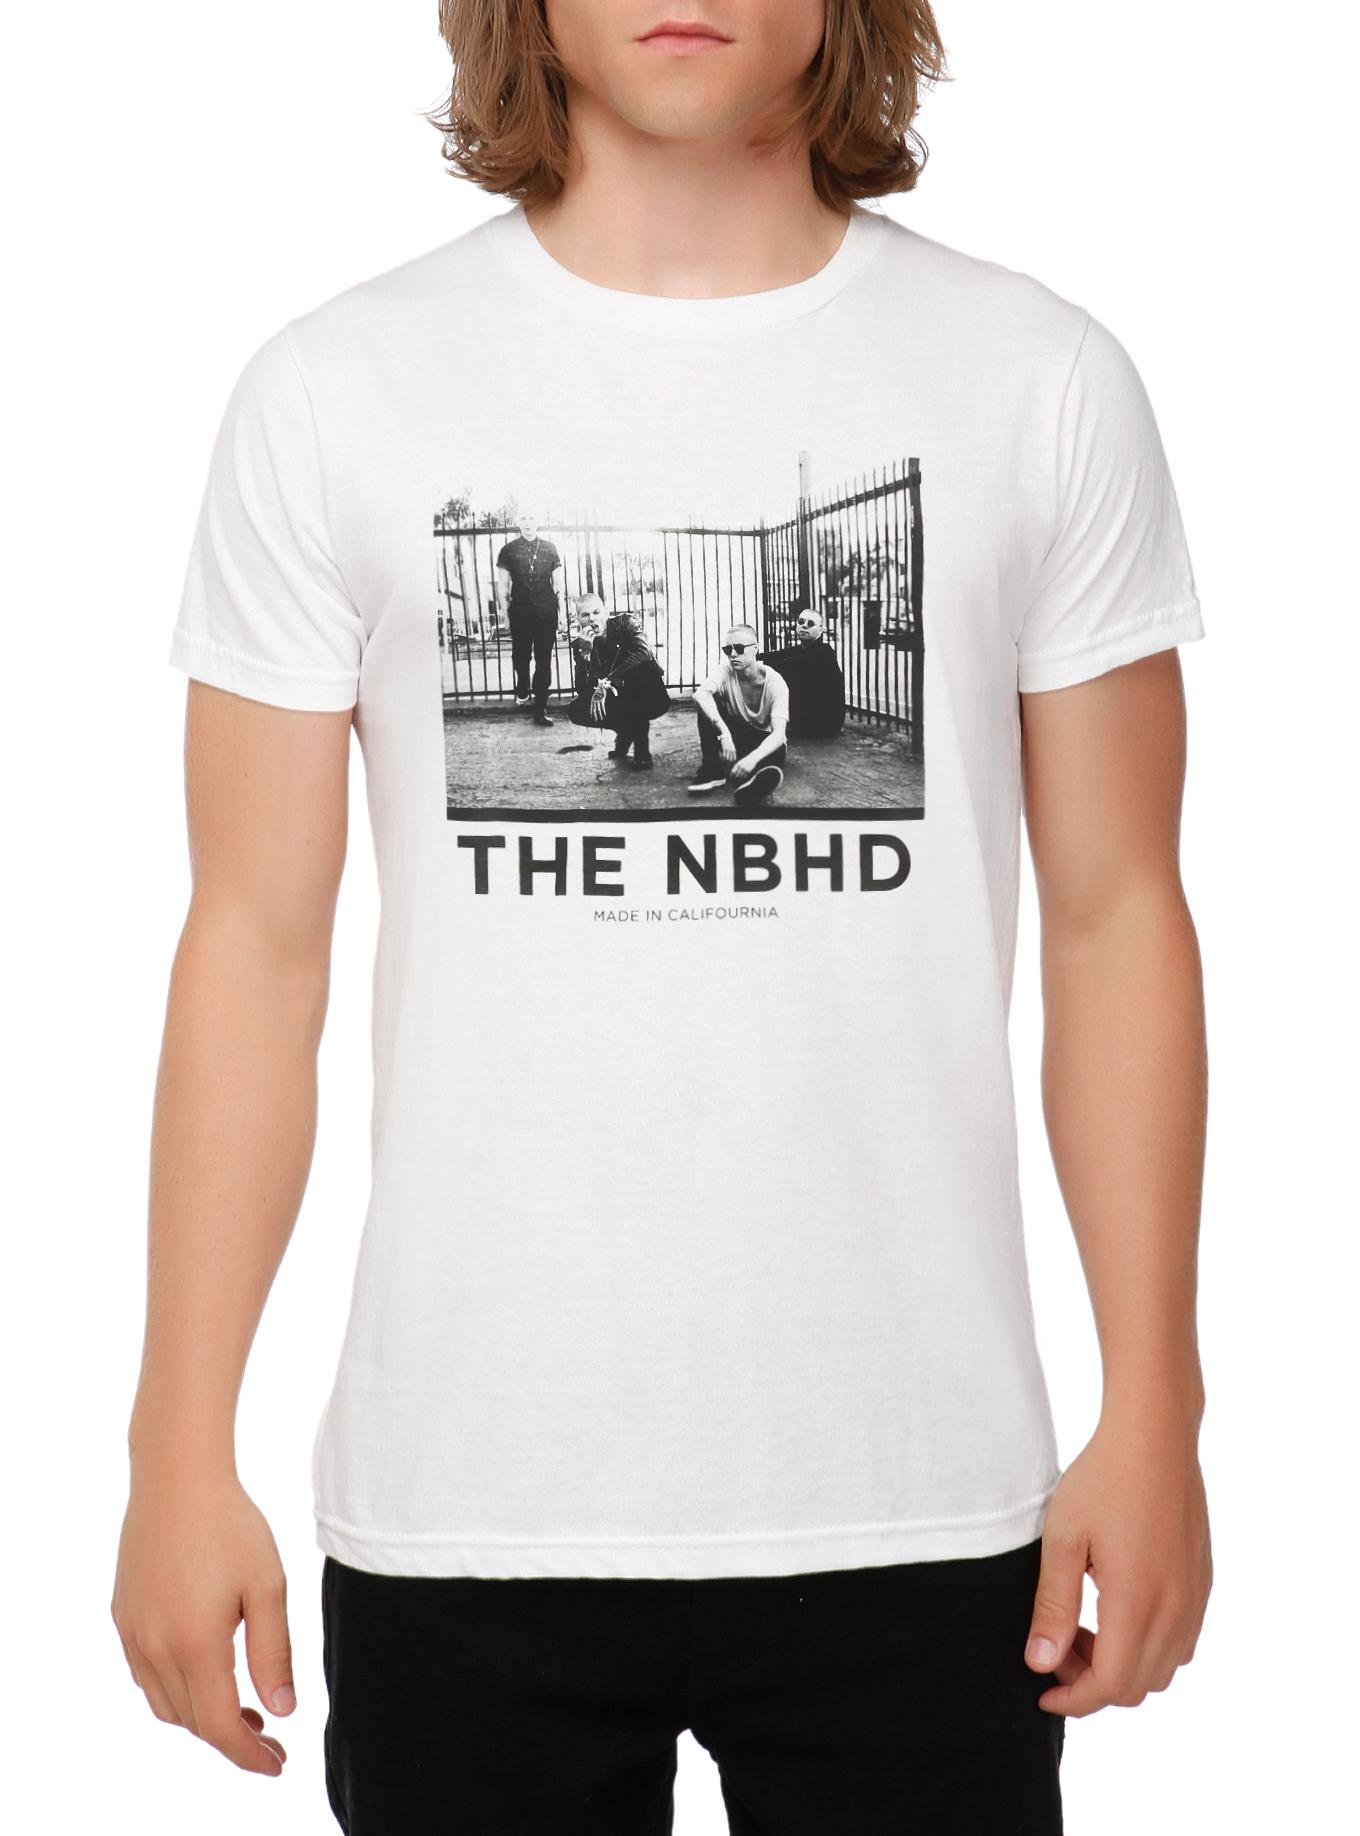 The Neighbourhood Made In Califournia T-Shirt | Hot Topic